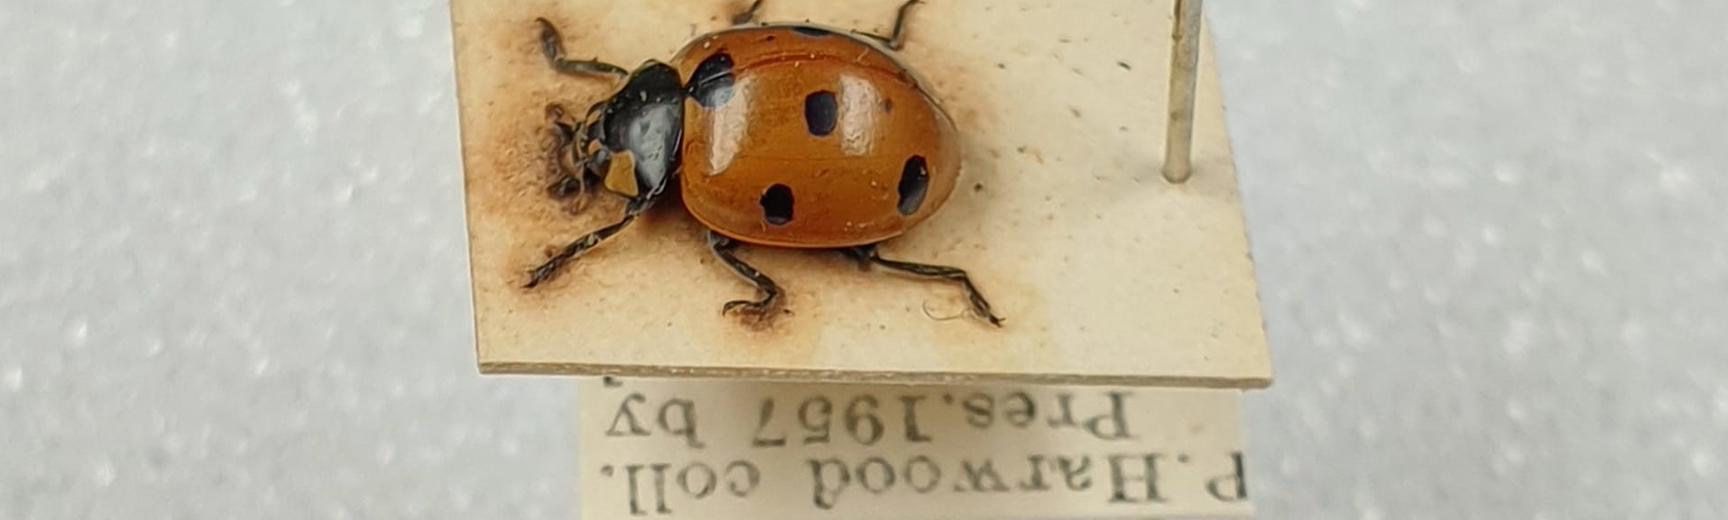 coleoptera ladybird